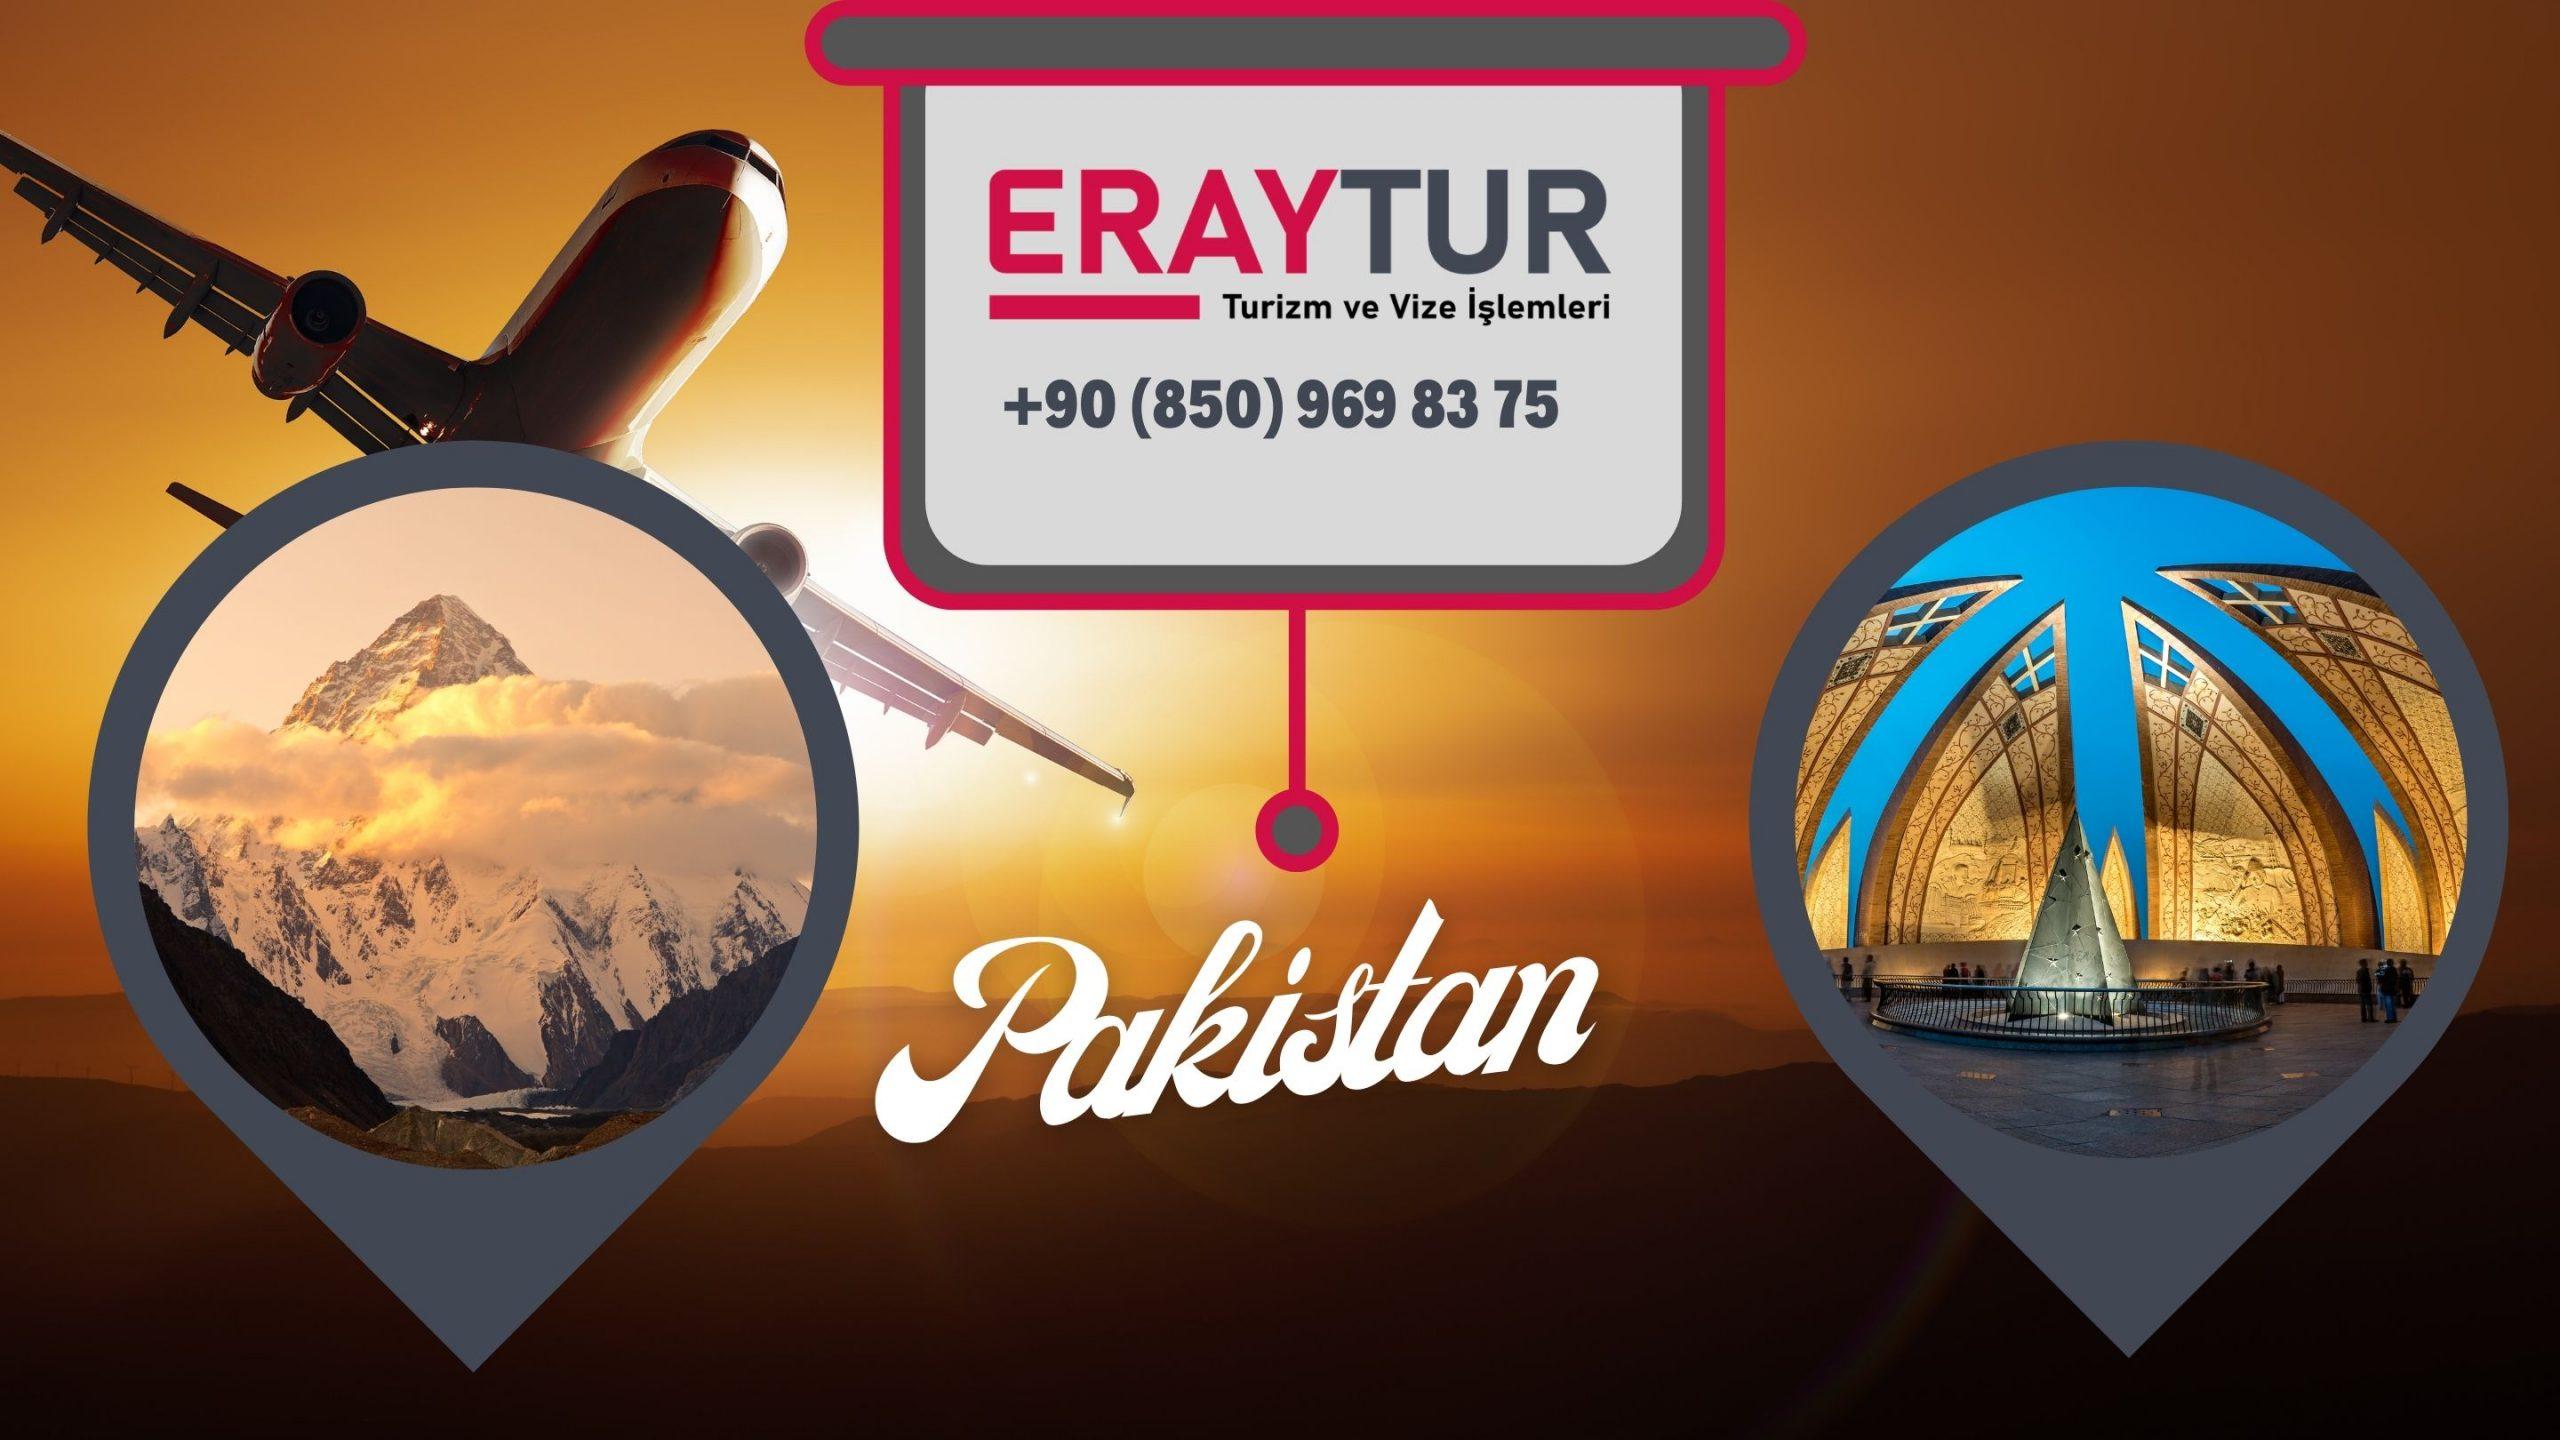 Pakistan Vize Ücreti